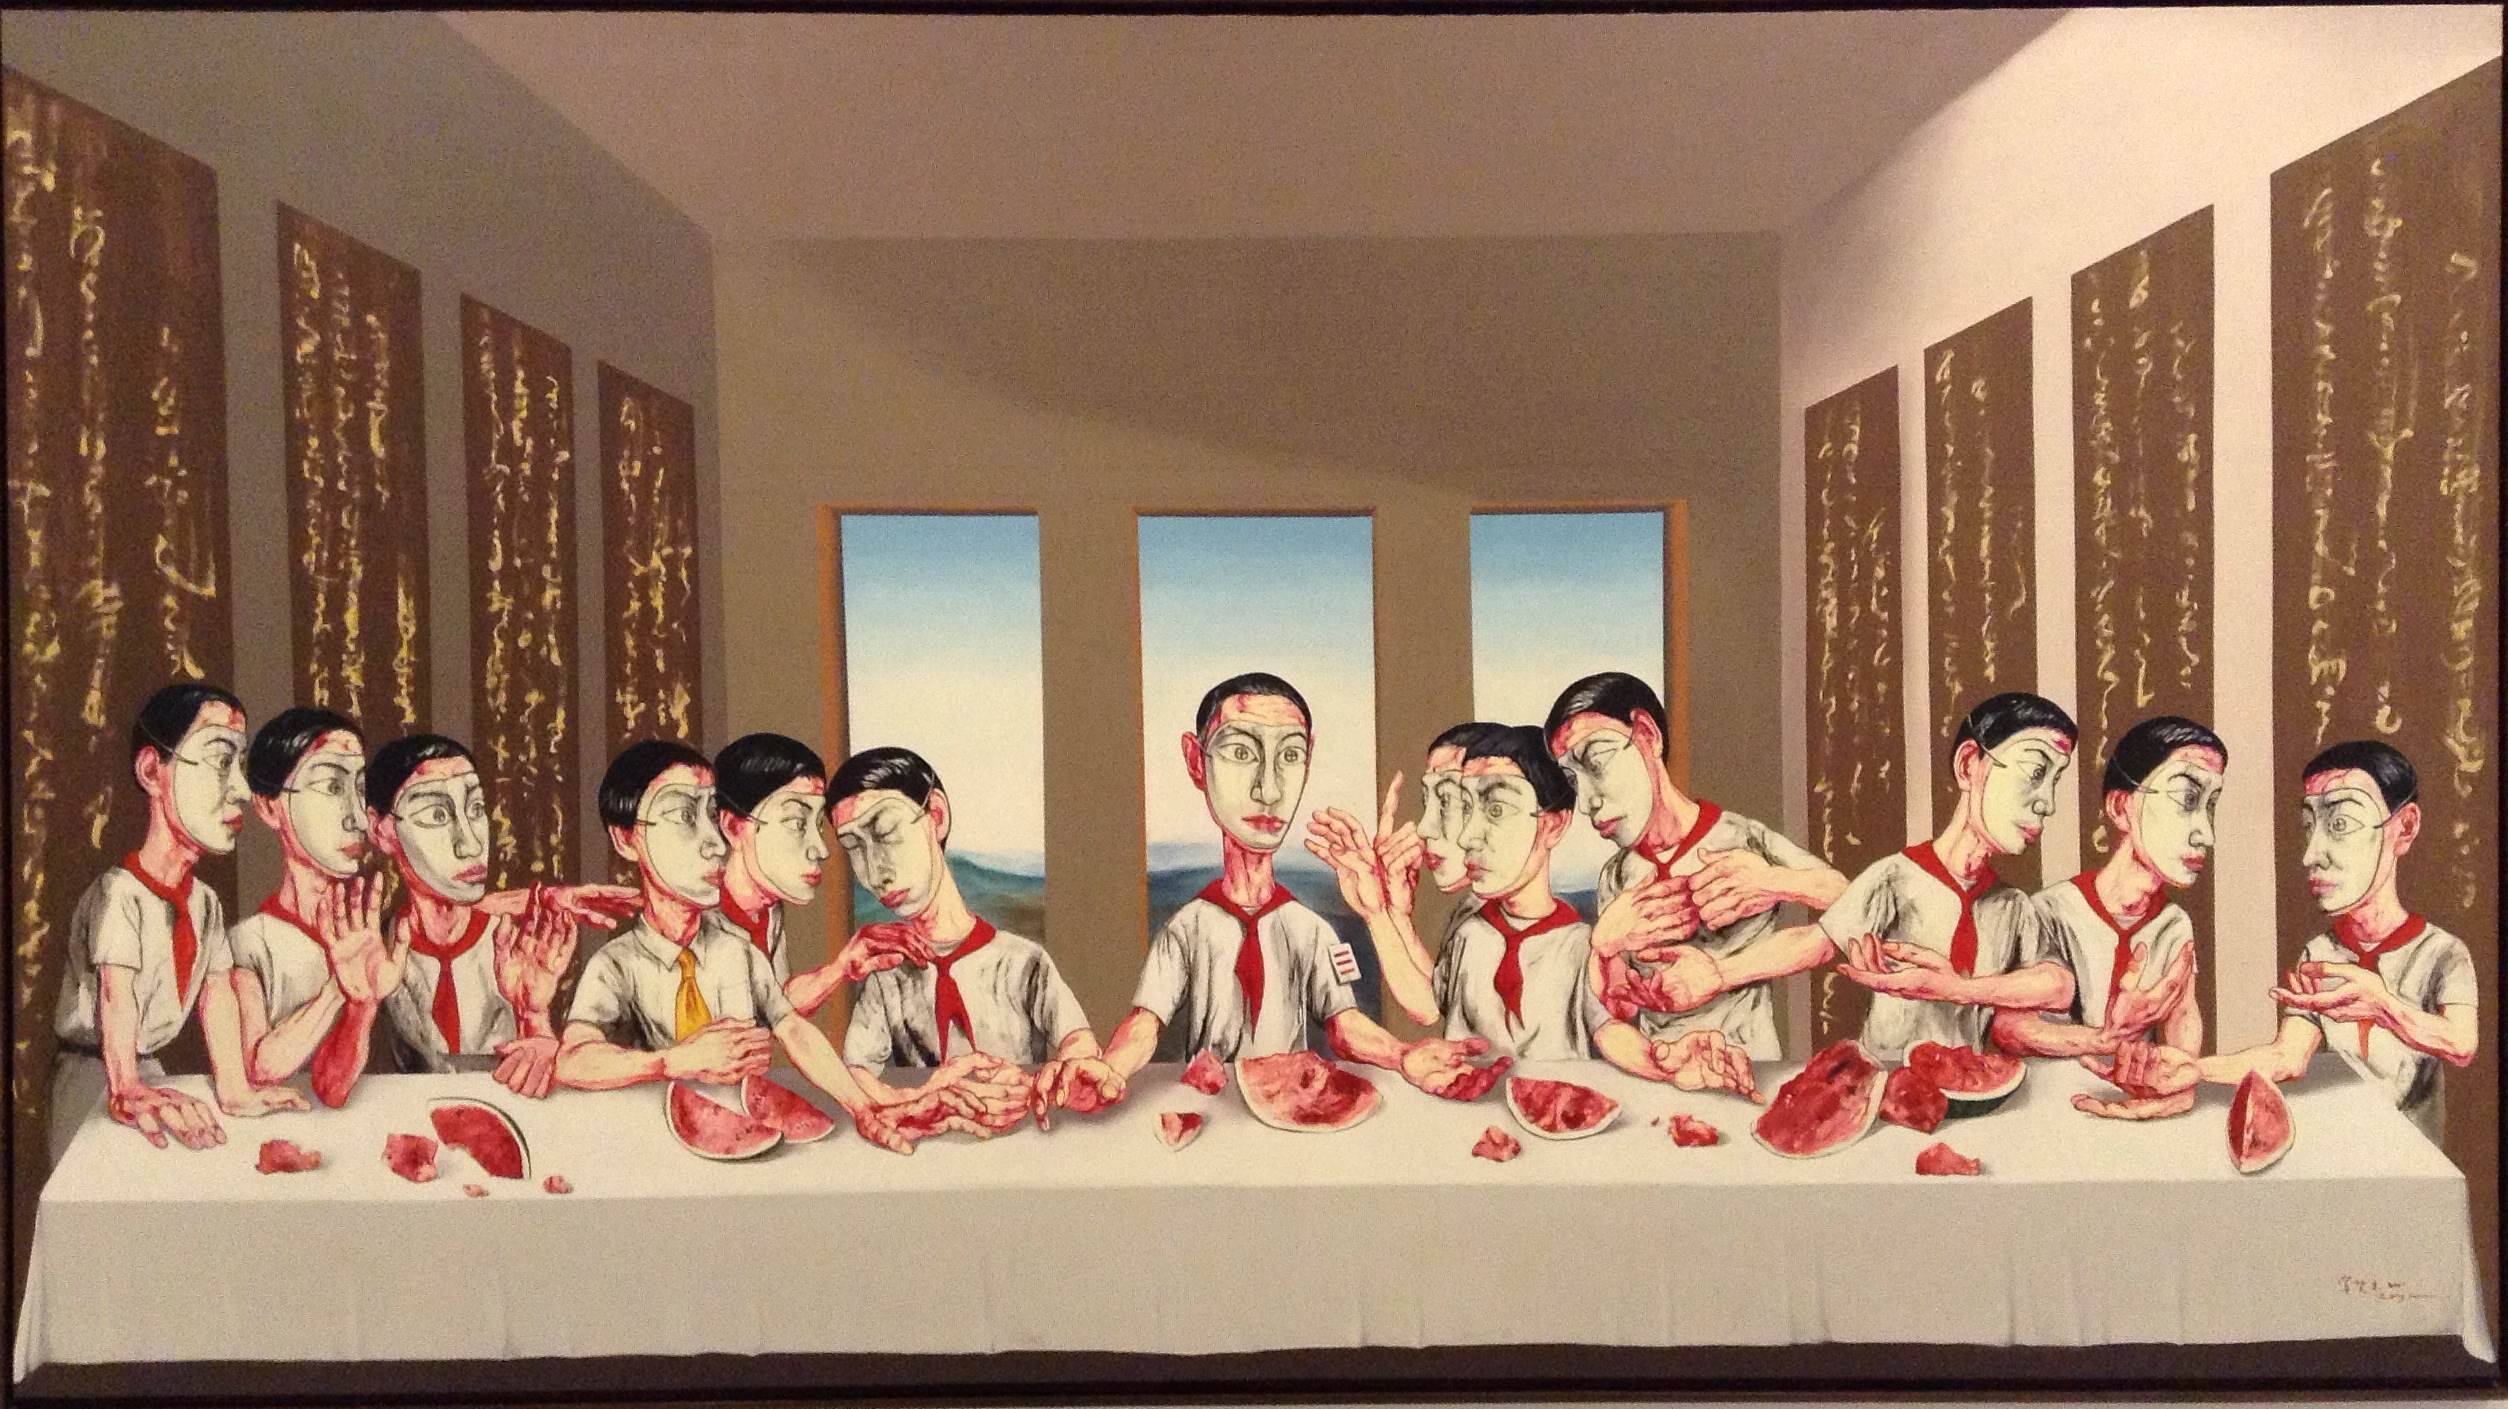 Zeng Fanzhi, The Last Supper, 2001